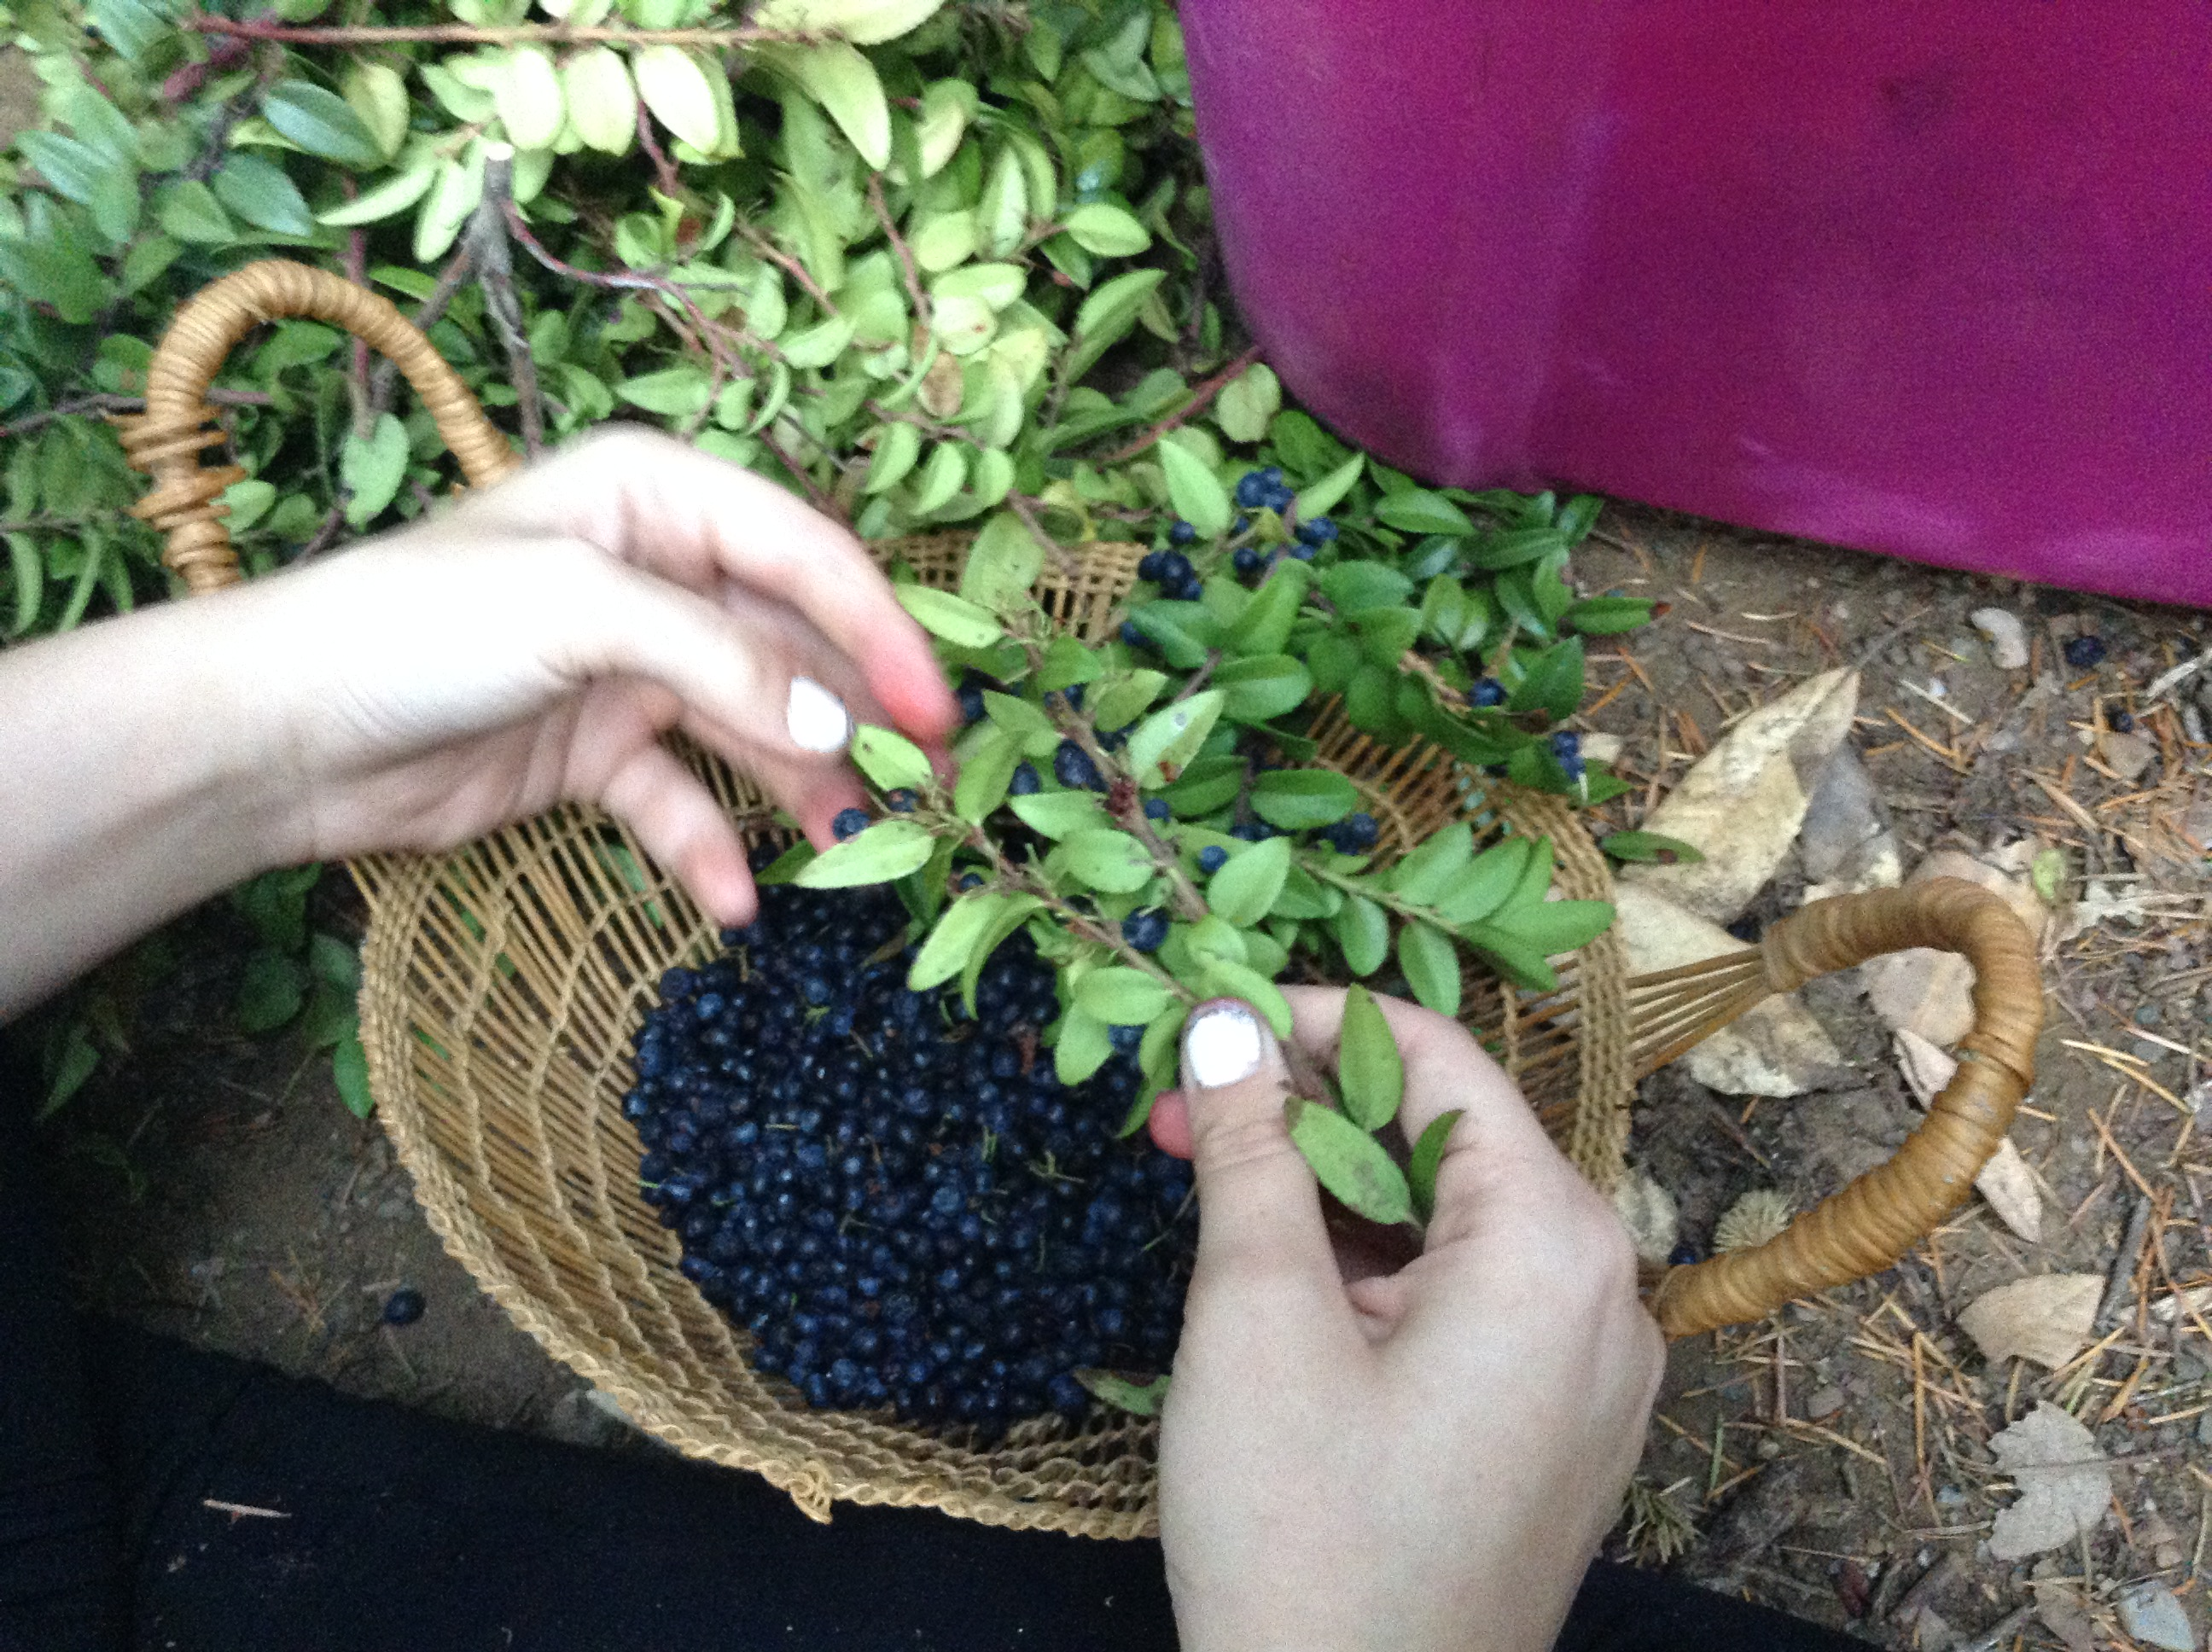 Managing Cultural Foods